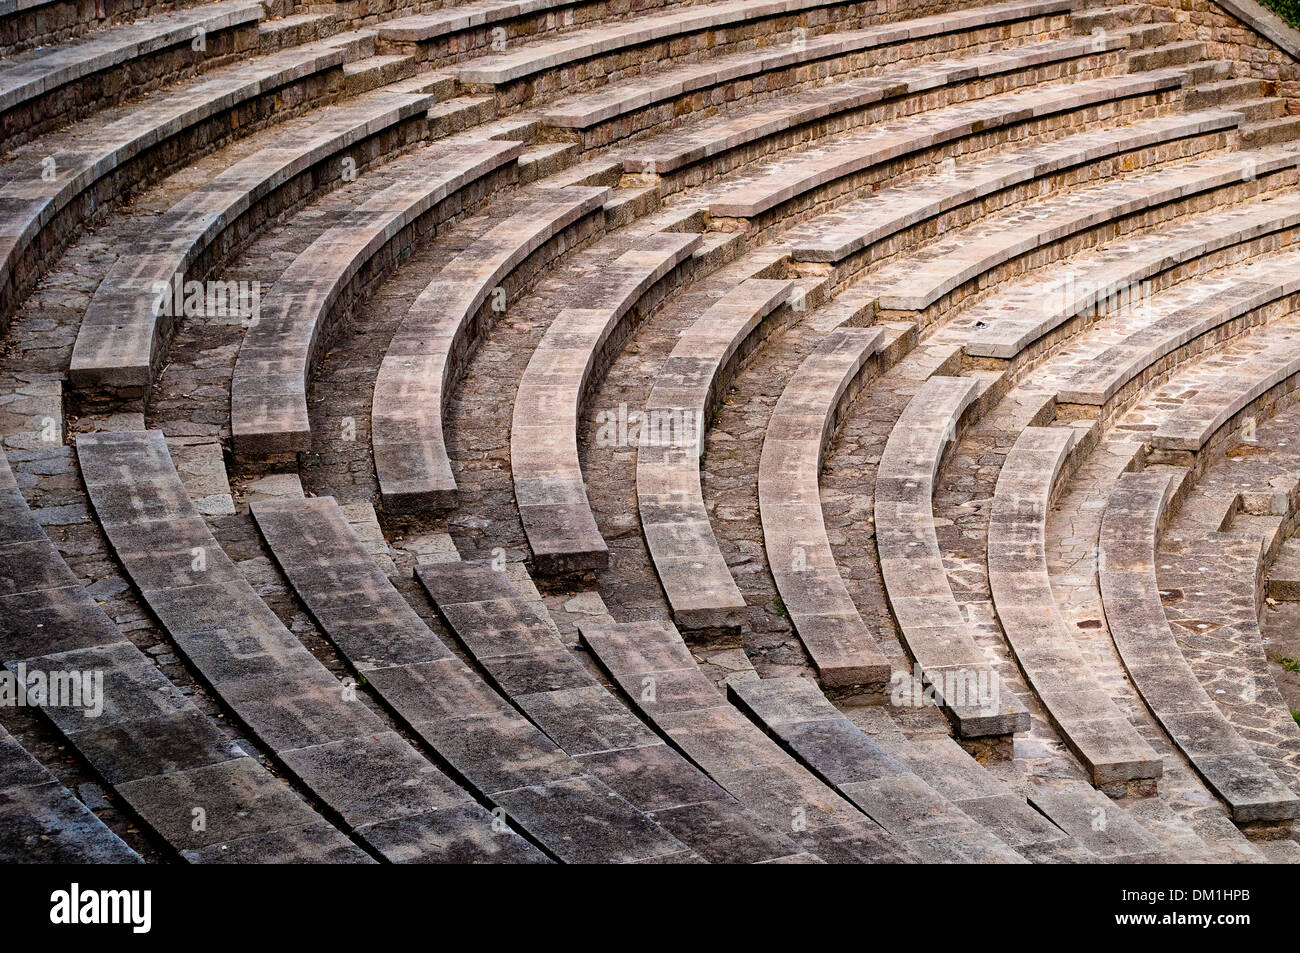 Greek Theatre - Teatre Grec amphitheatre, Montjuic, Barcelona, Catalonia, Spain - Stock Image